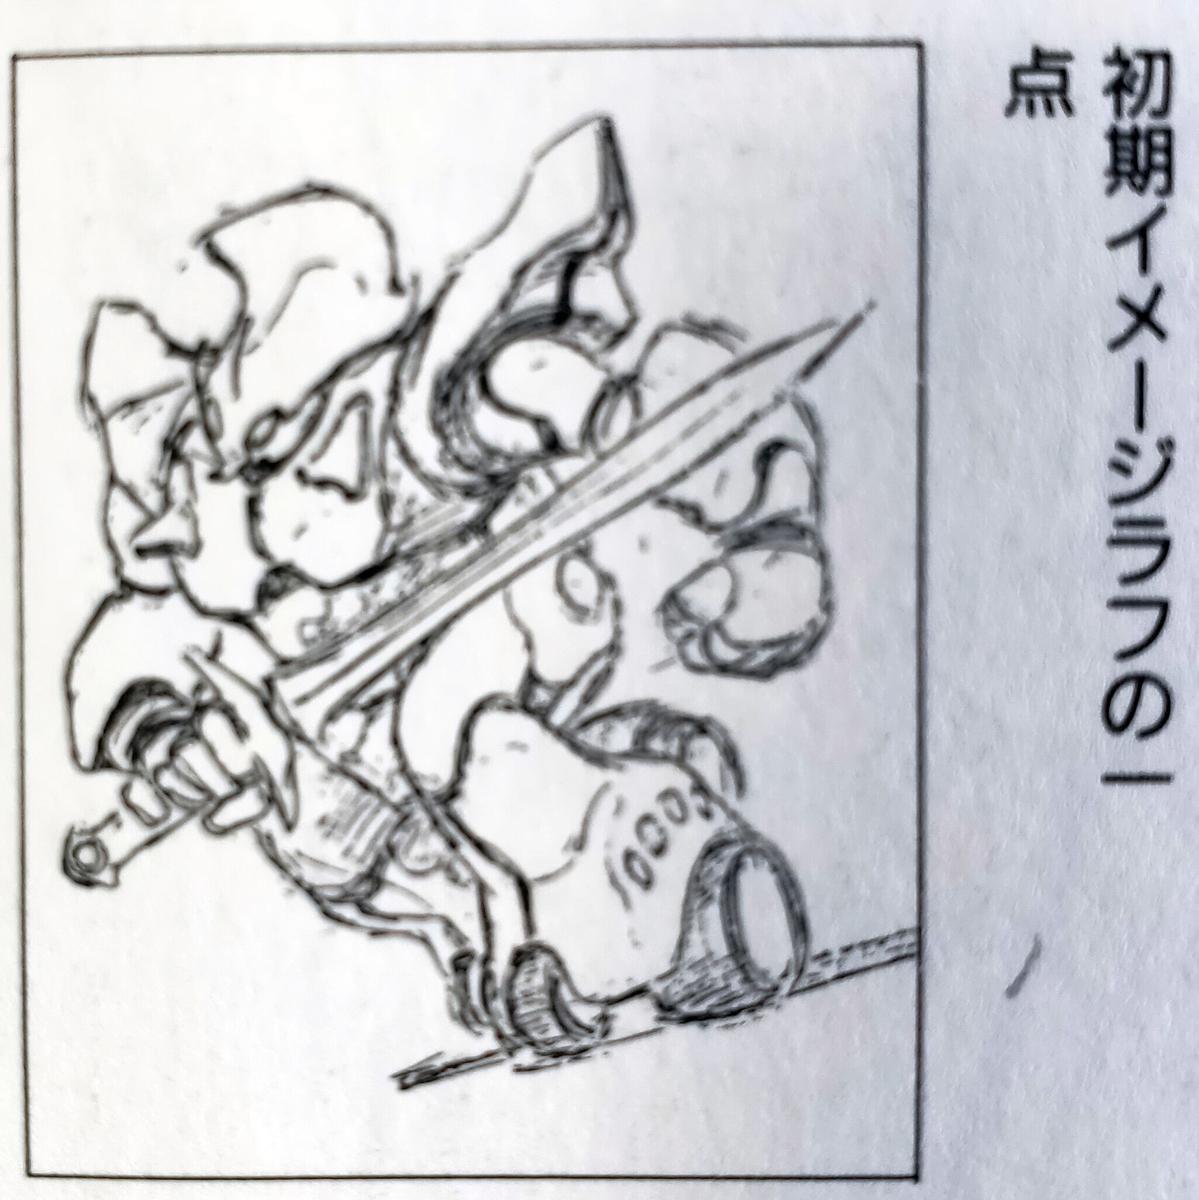 f:id:hiroban-ch:20200308144602j:plain